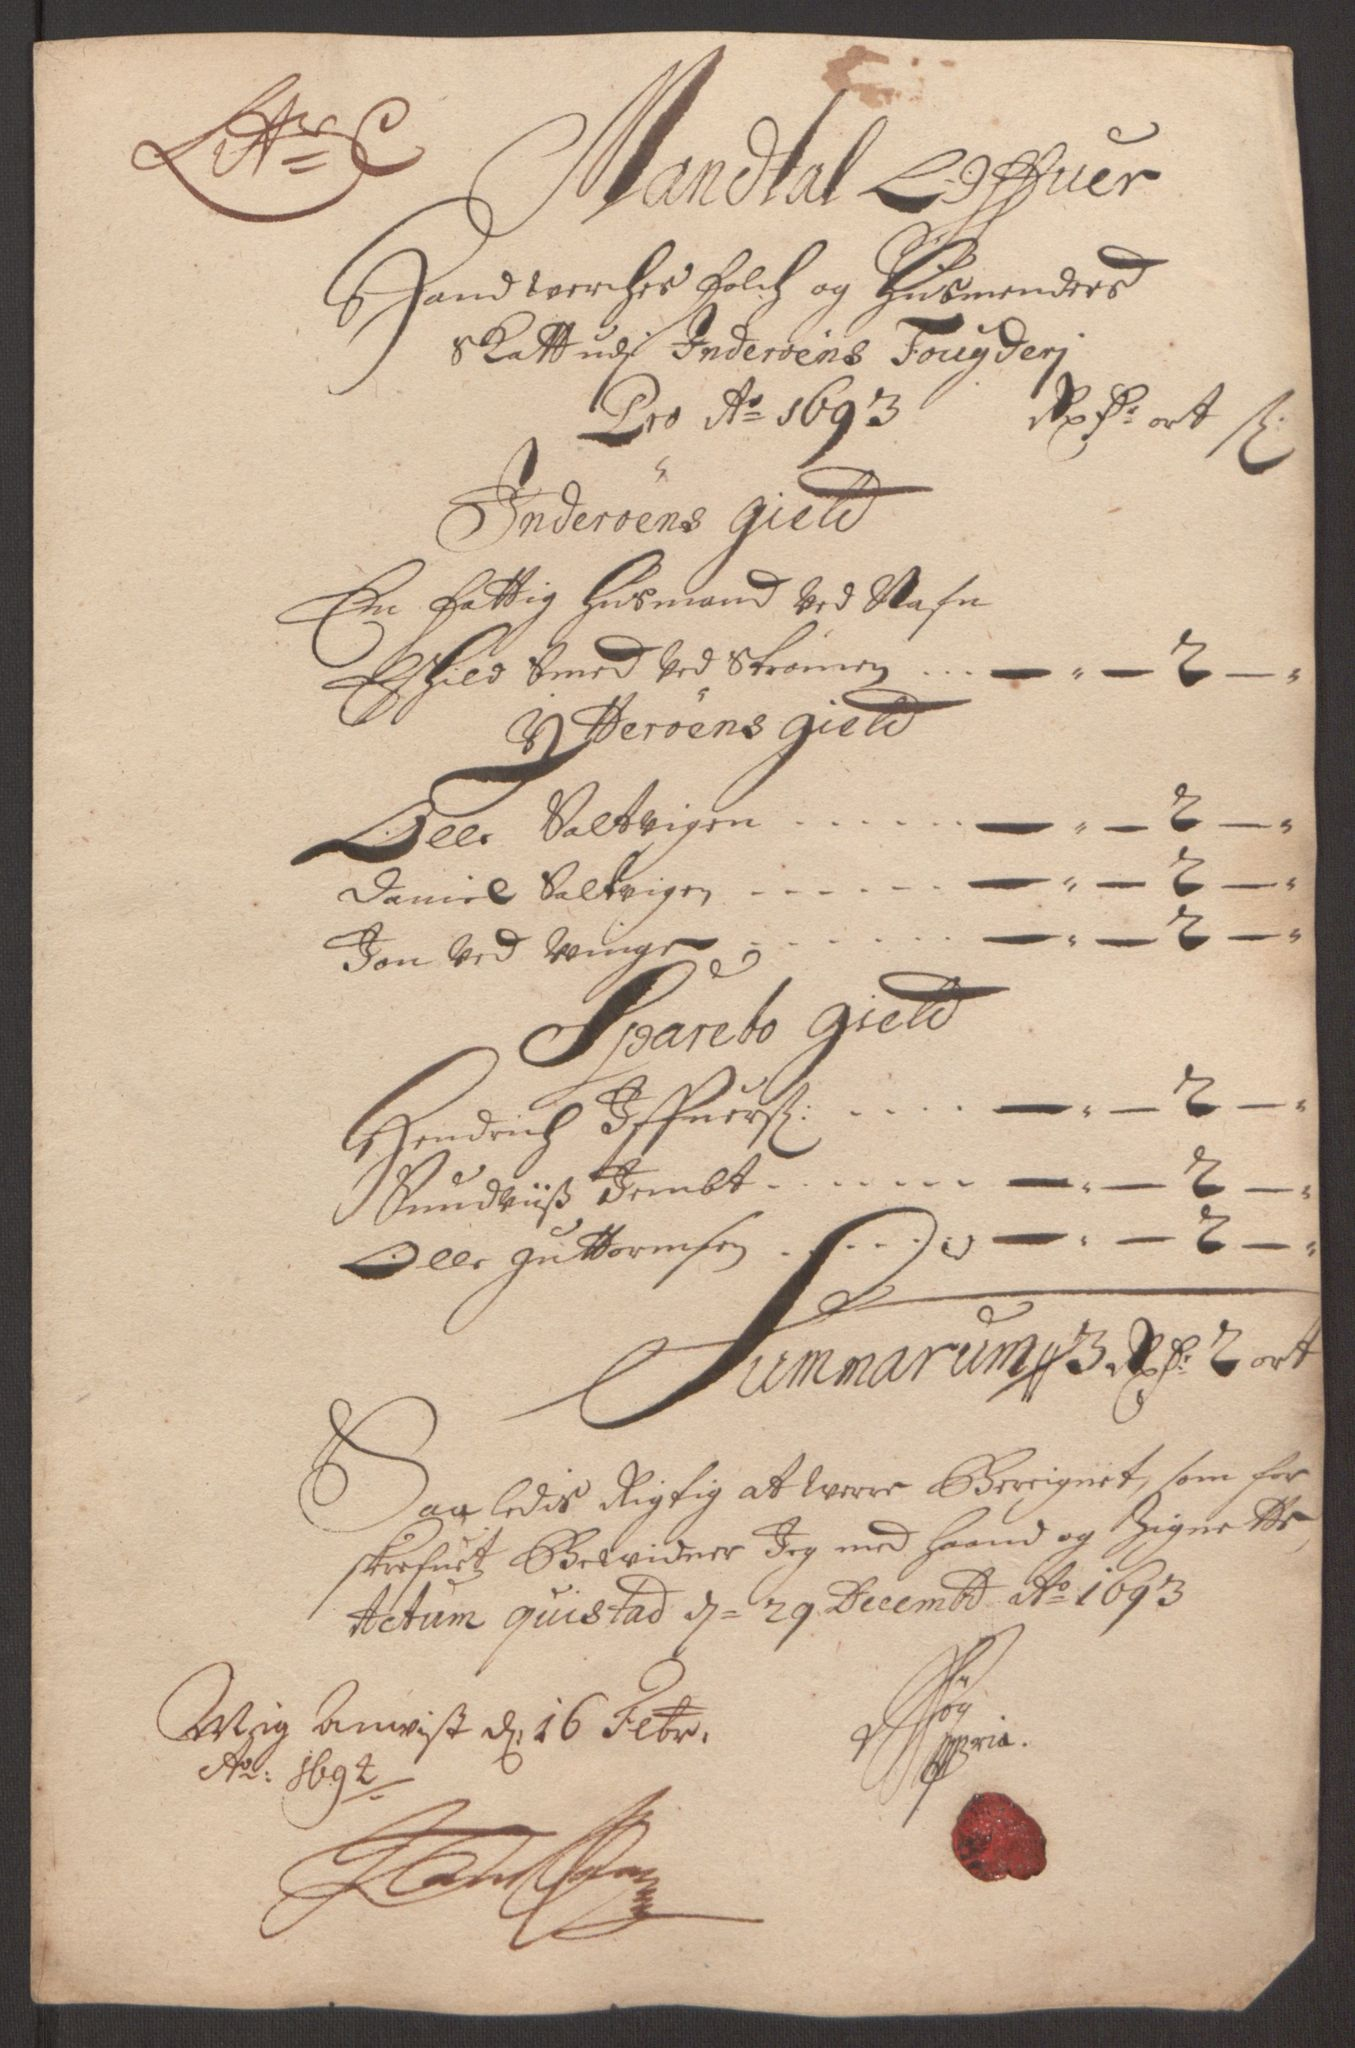 RA, Rentekammeret inntil 1814, Reviderte regnskaper, Fogderegnskap, R63/L4308: Fogderegnskap Inderøy, 1692-1694, s. 431